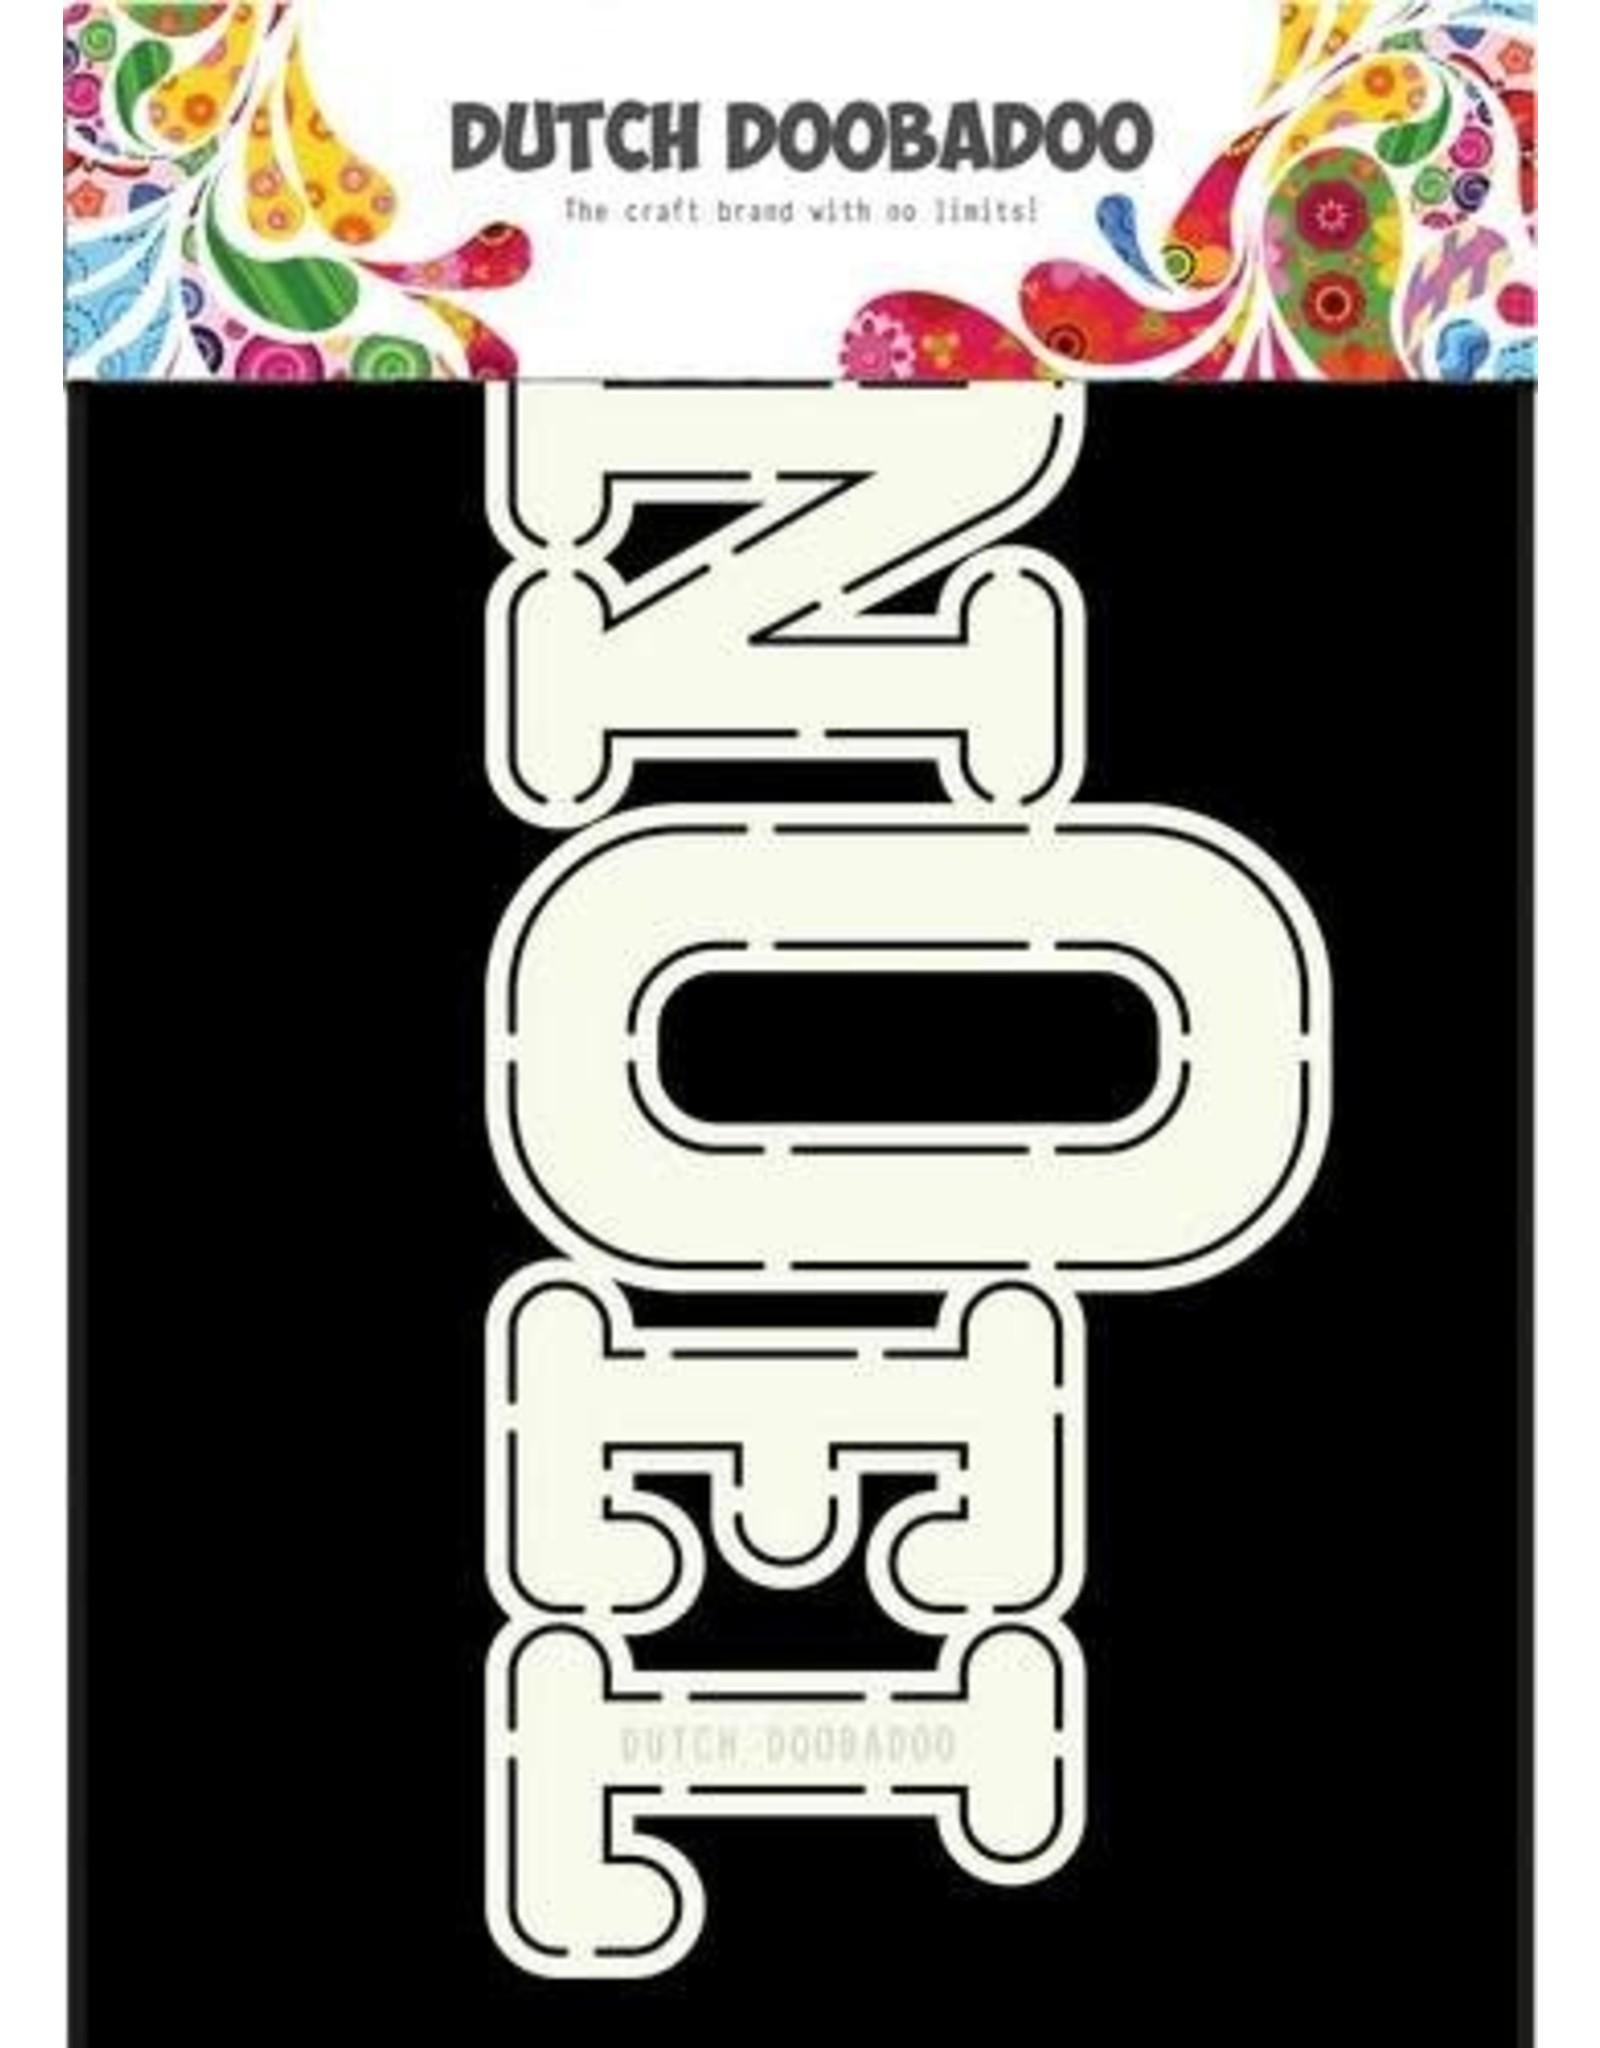 Dutch Doobadoo Dutch Card Art Noel 470.713.662 A5